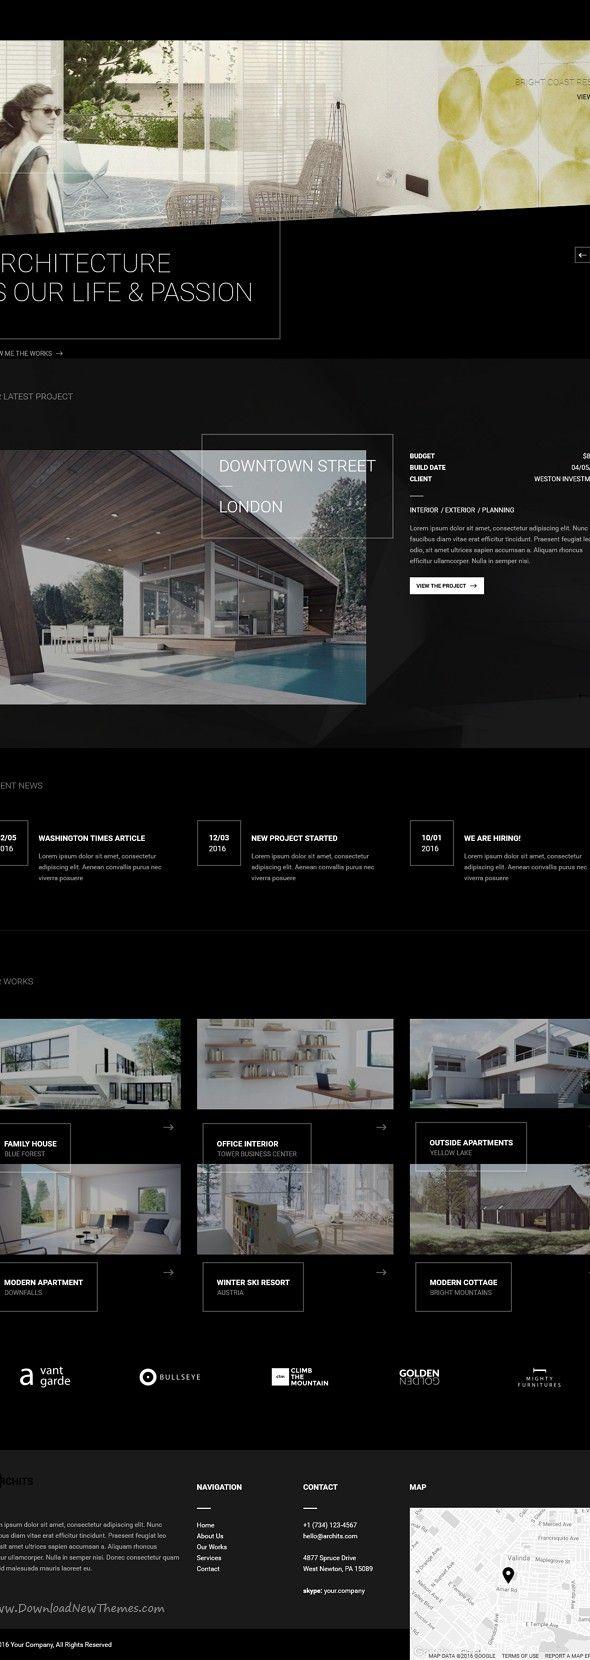 Archits Responsive Architecture Template Disenos De Unas Constructora